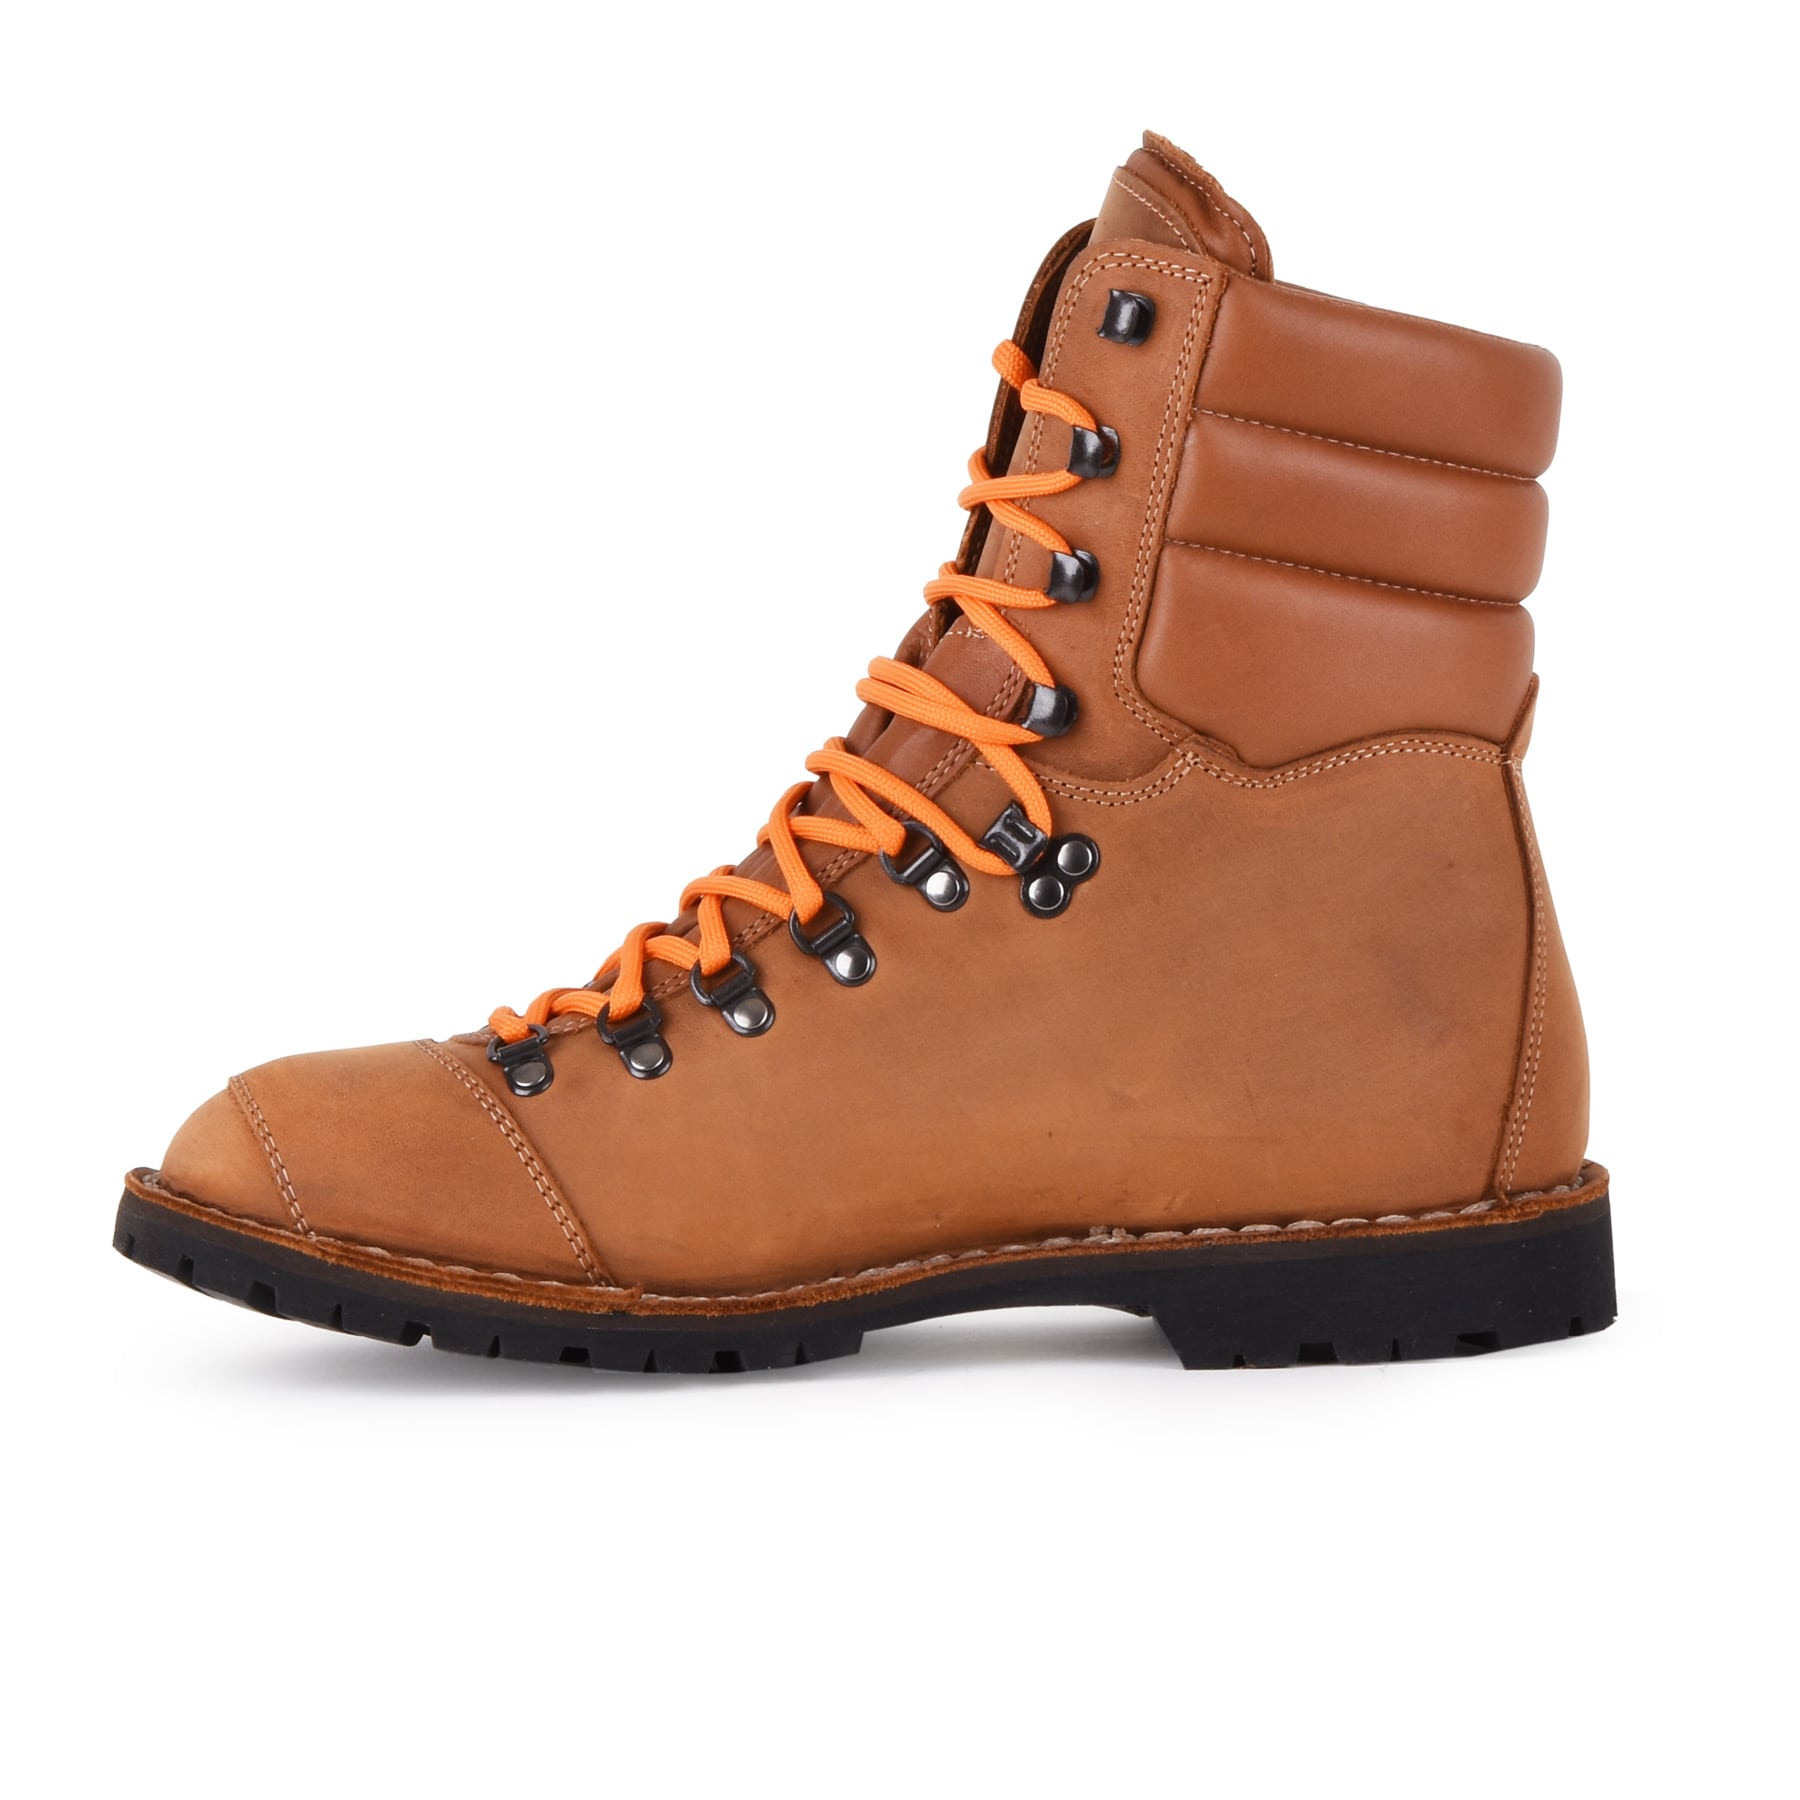 Biker Boot AdventureSE Denver Brandy, brandy heren boot, crème stiksel